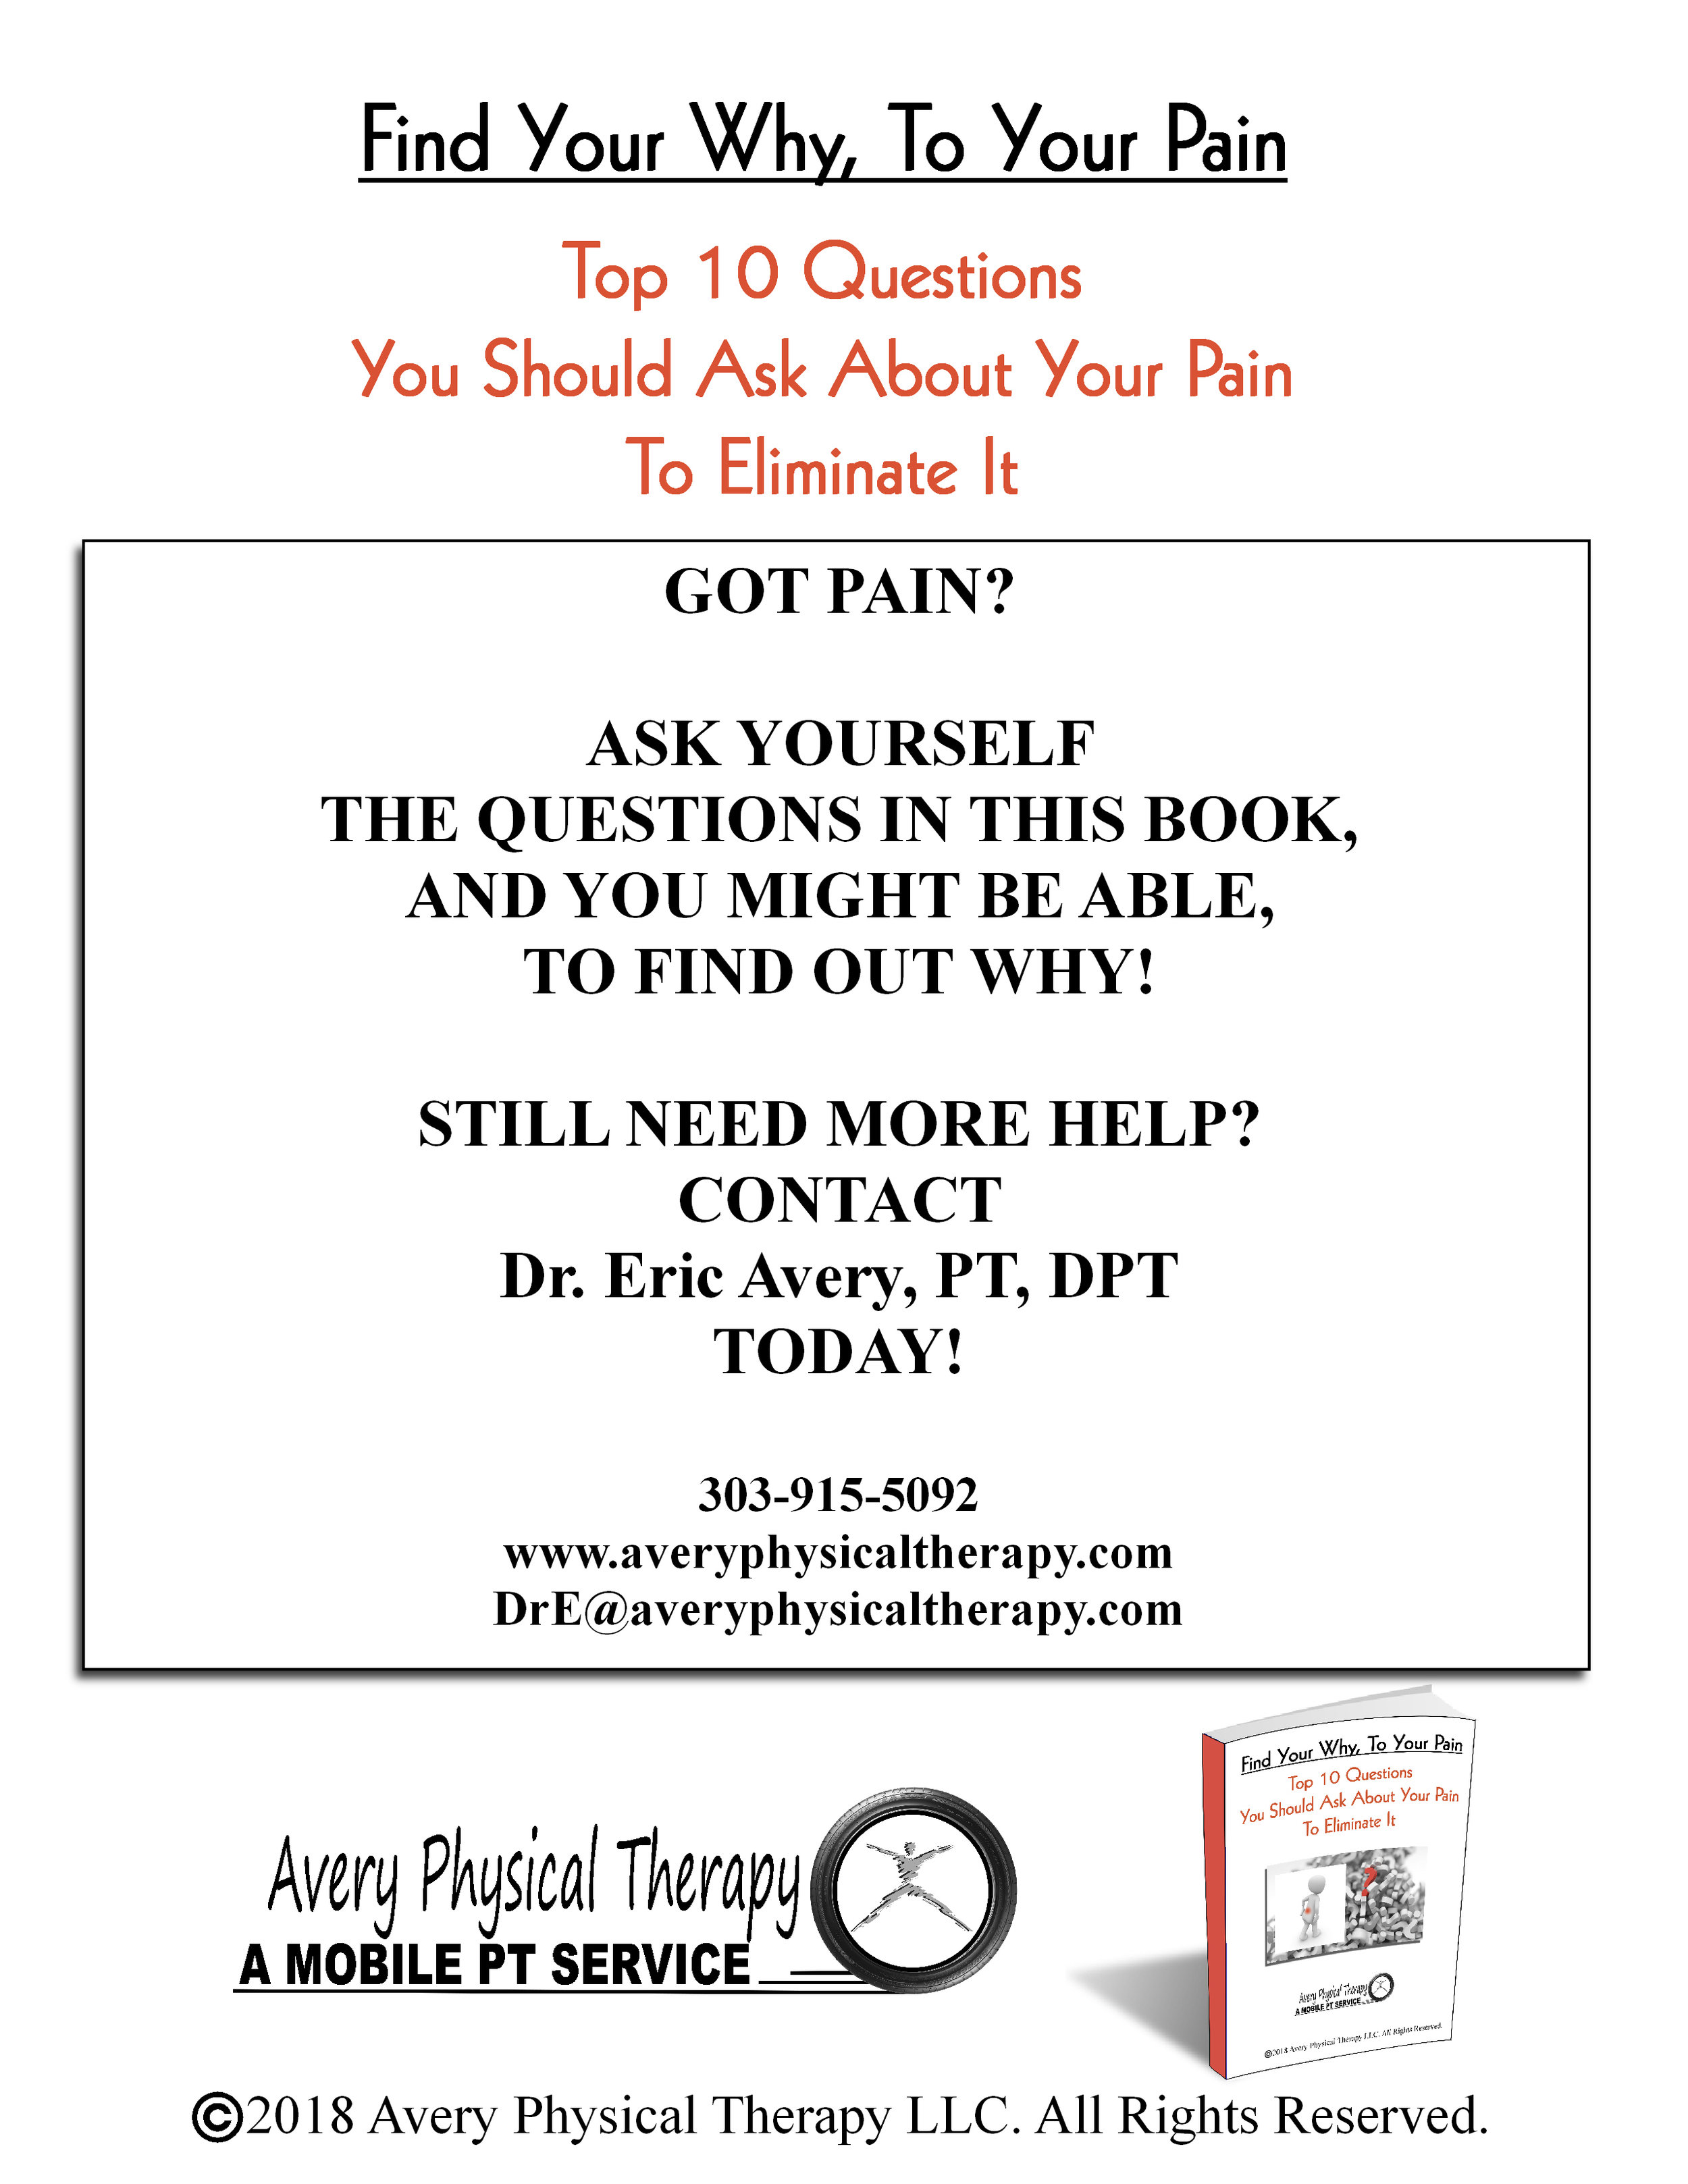 Top 10 Pain Questions 1-3B.JPG